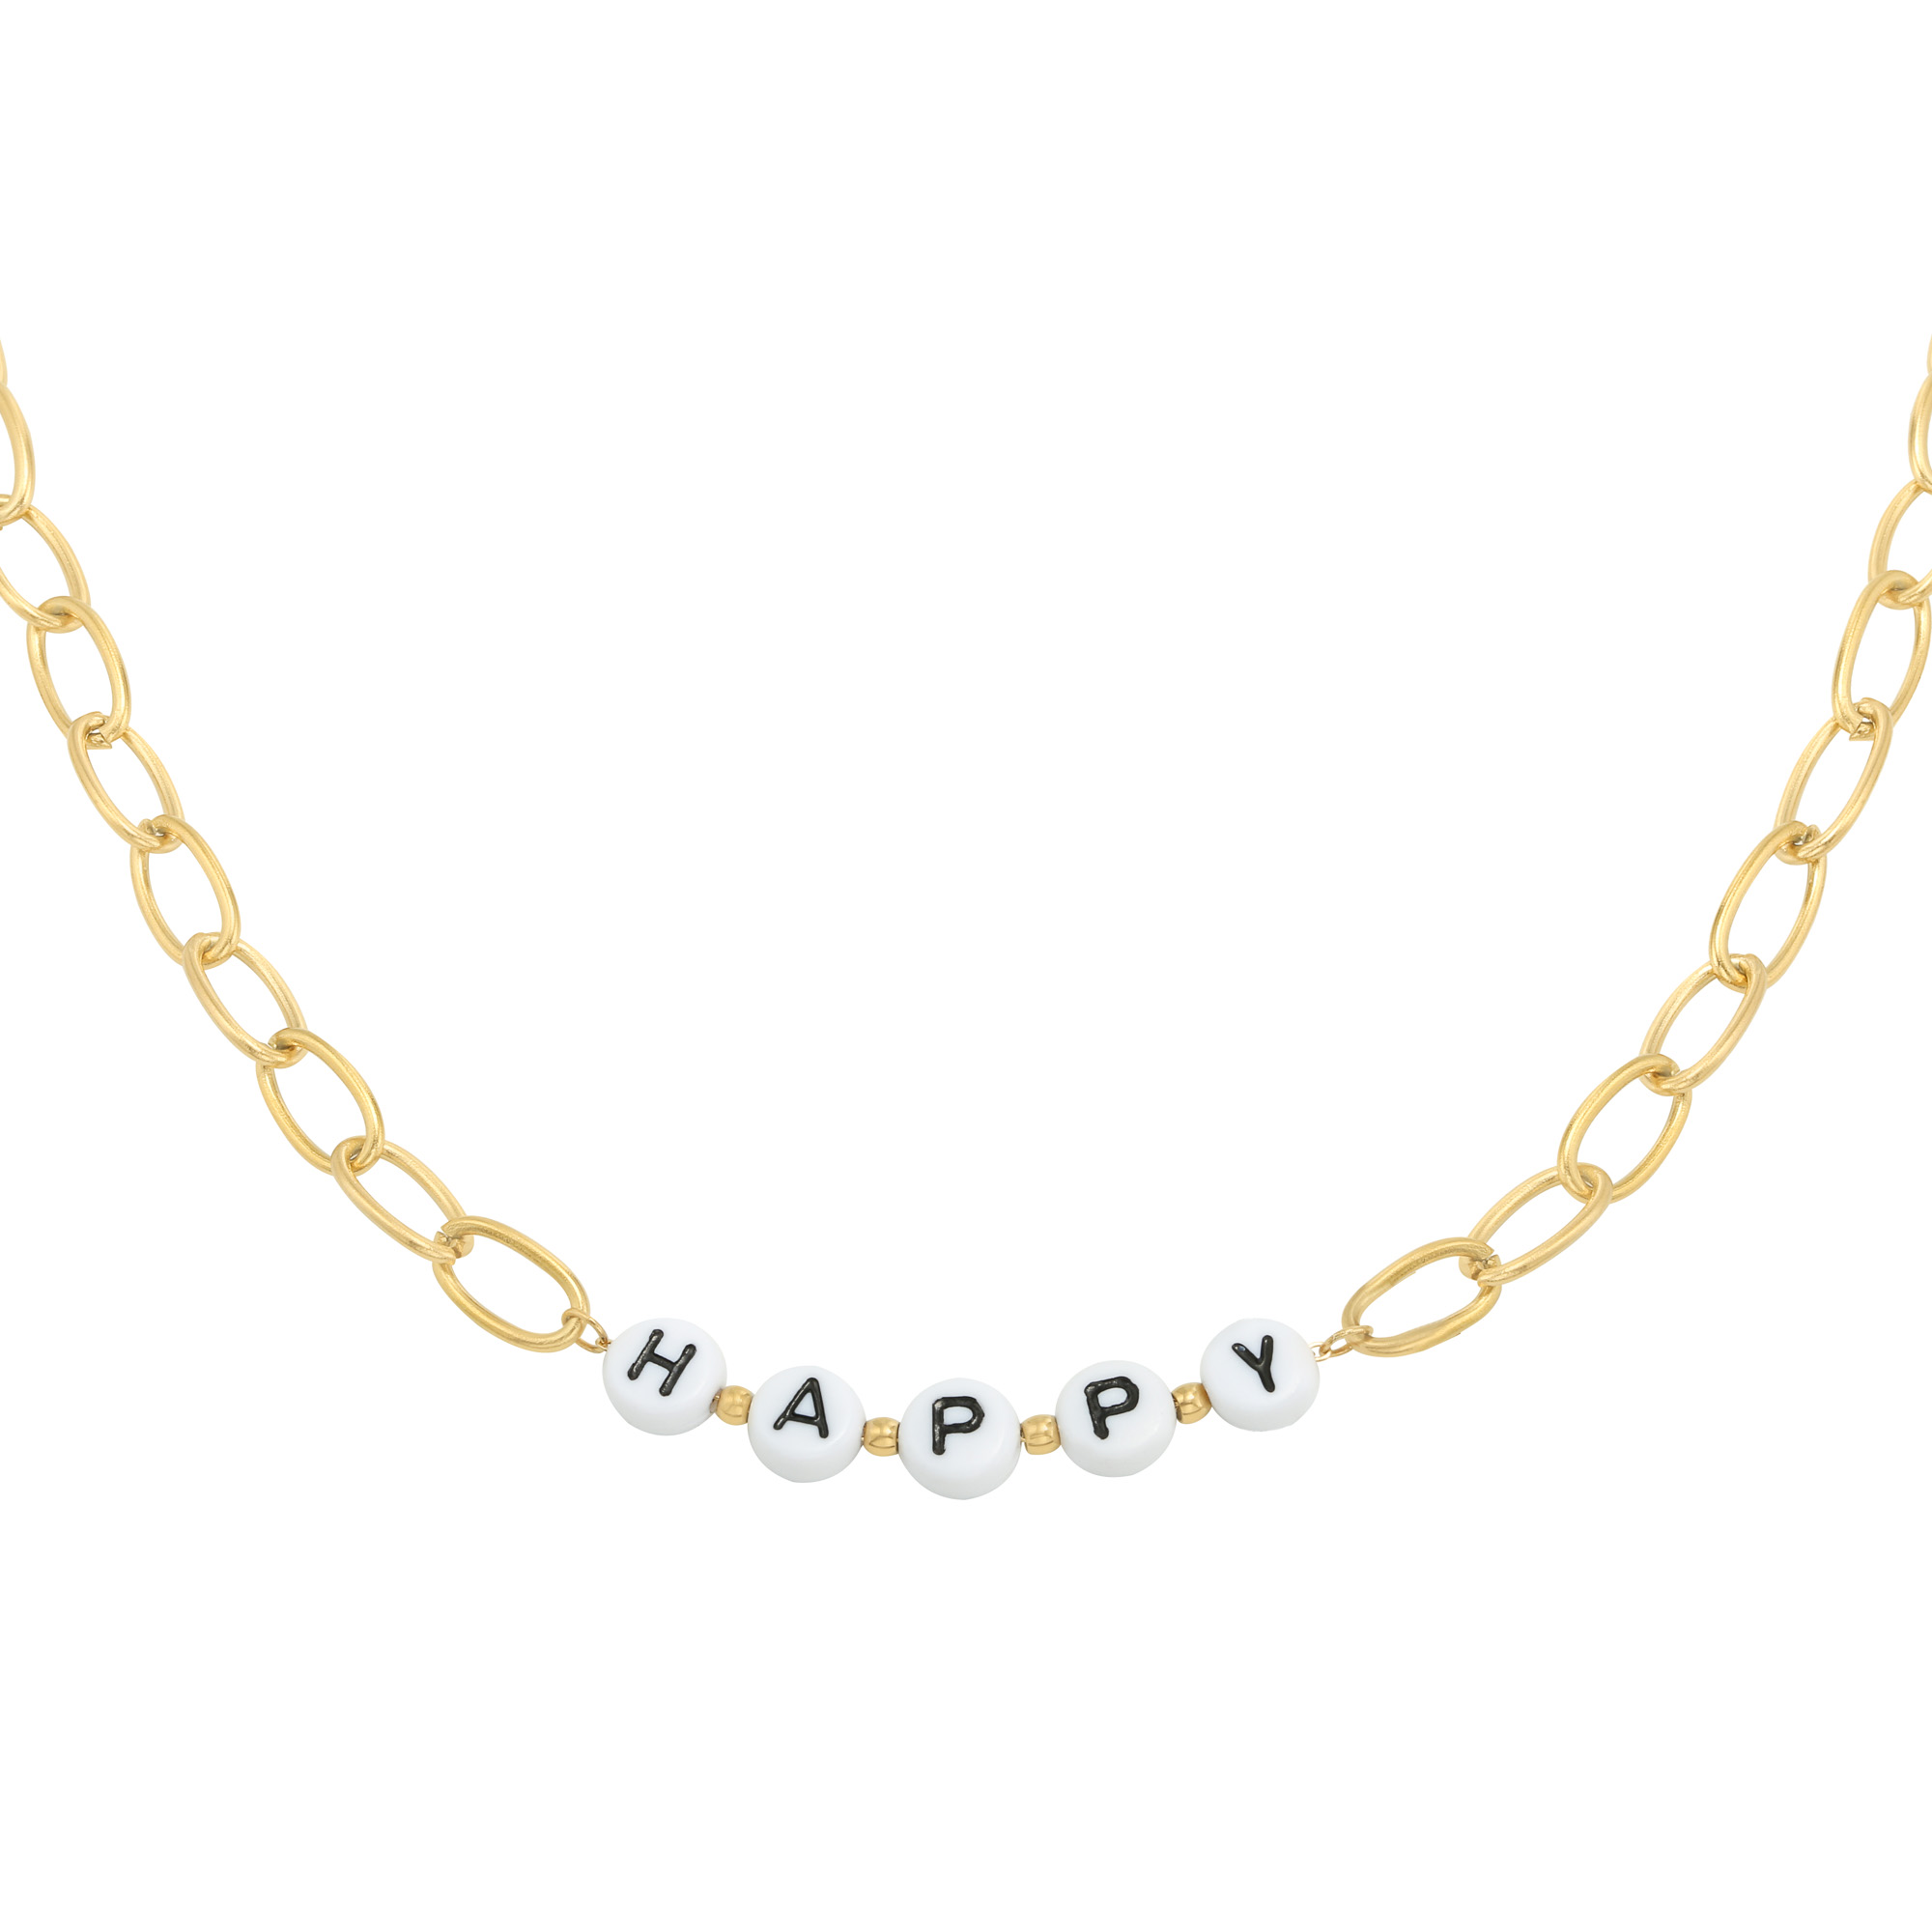 Collier Beads Happy